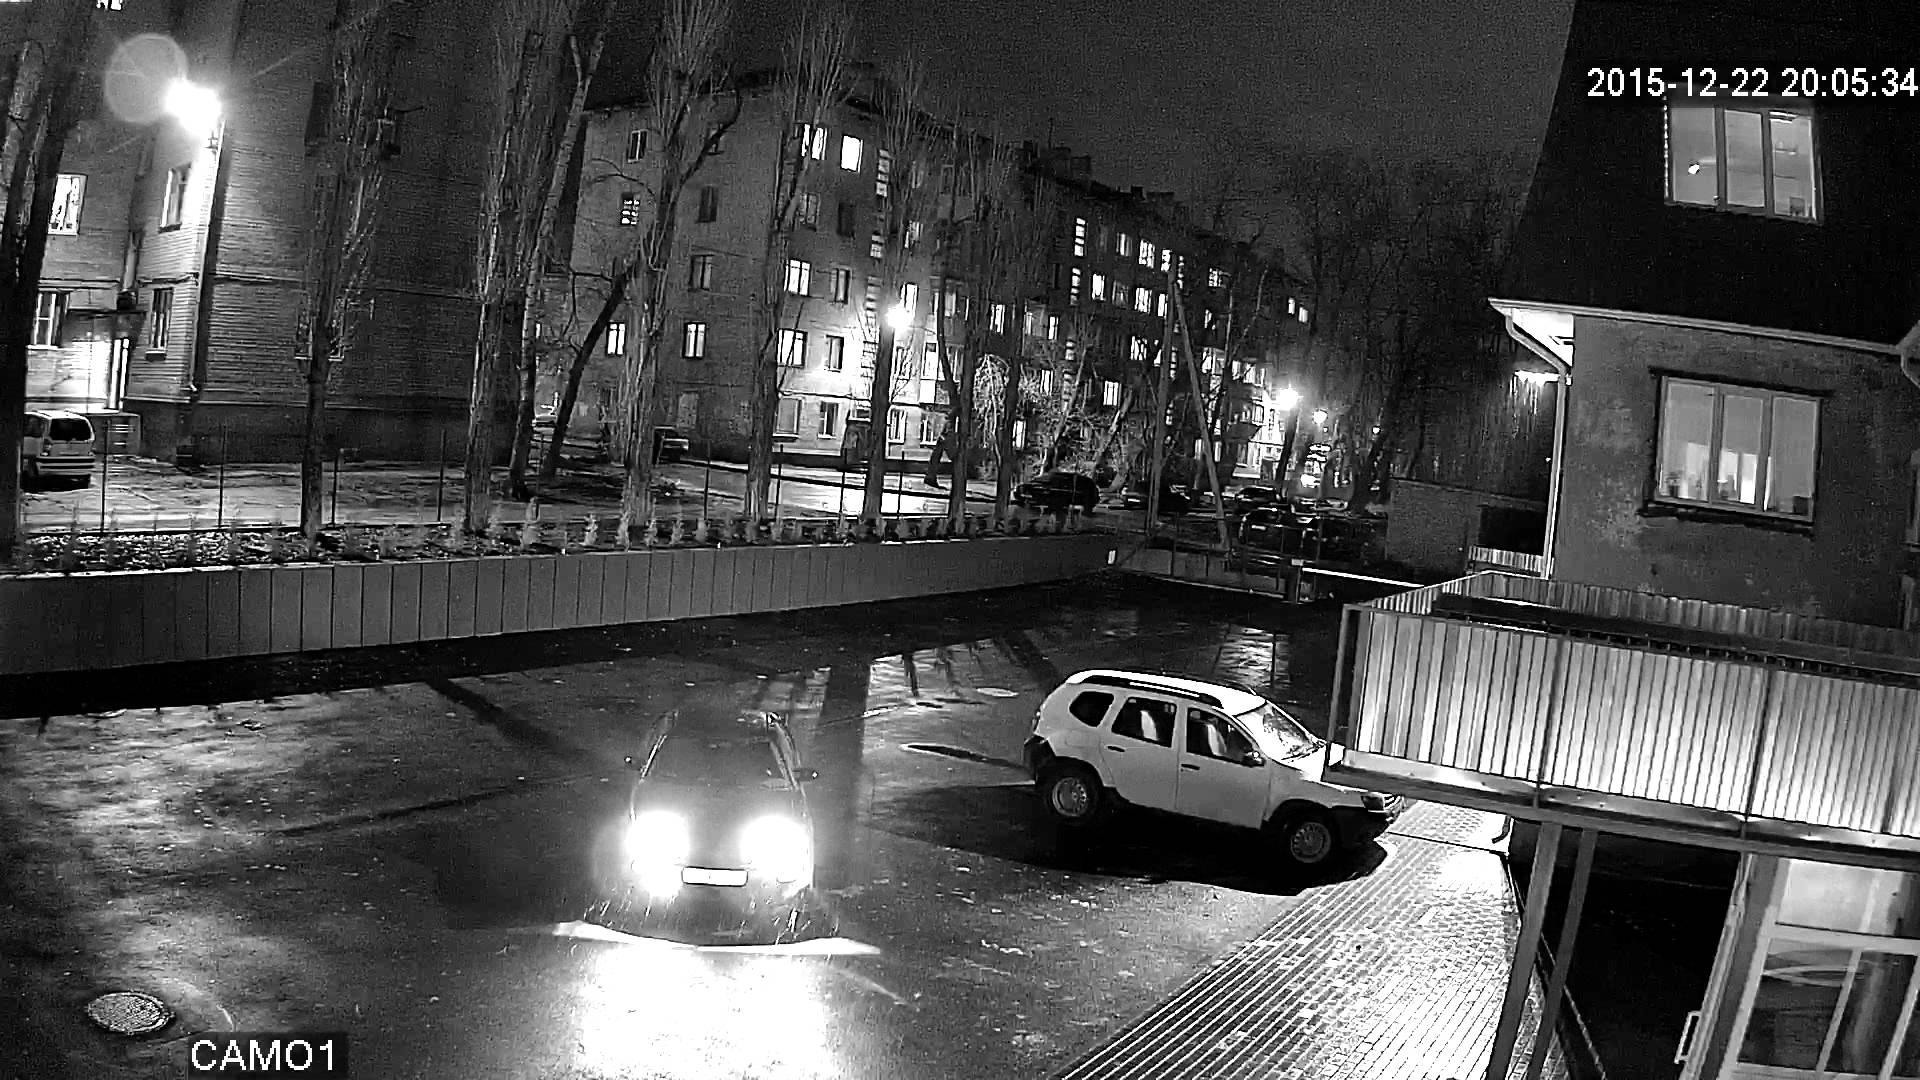 imx323 пример ночной съемки